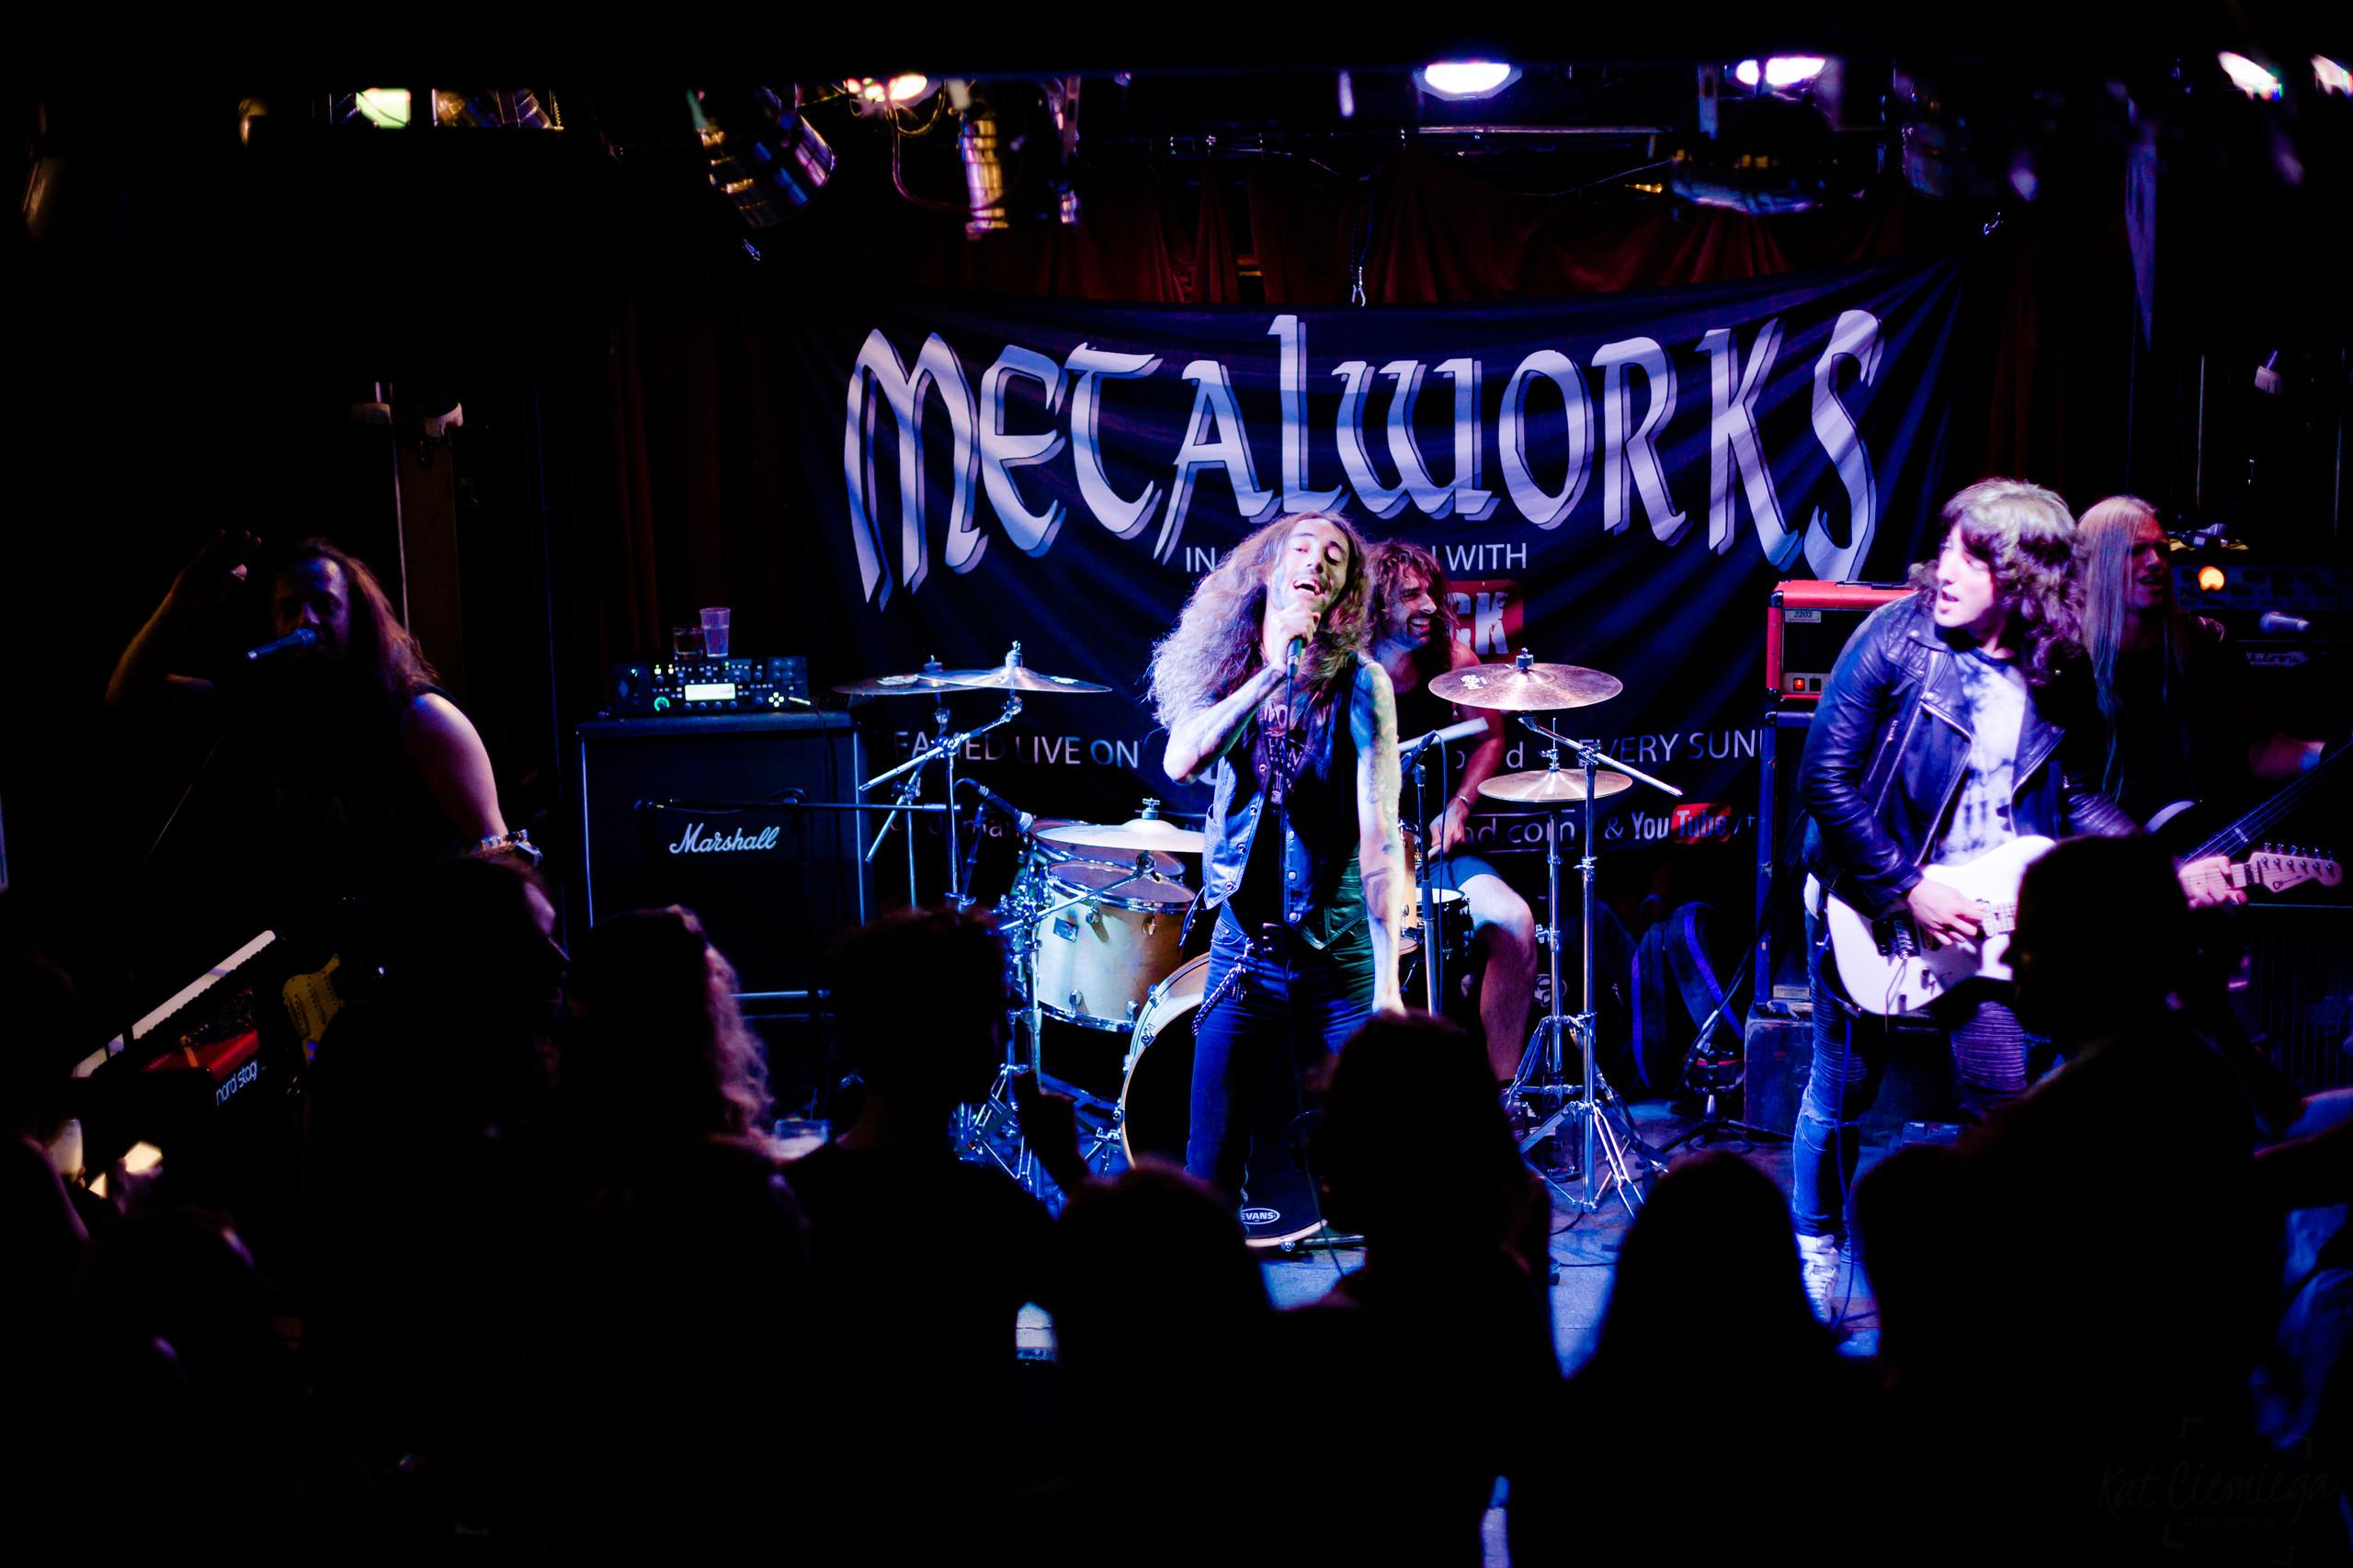 Kat Ciemiega Photography, Metalworks, The Monarch Camden, Camden, Concert Photography